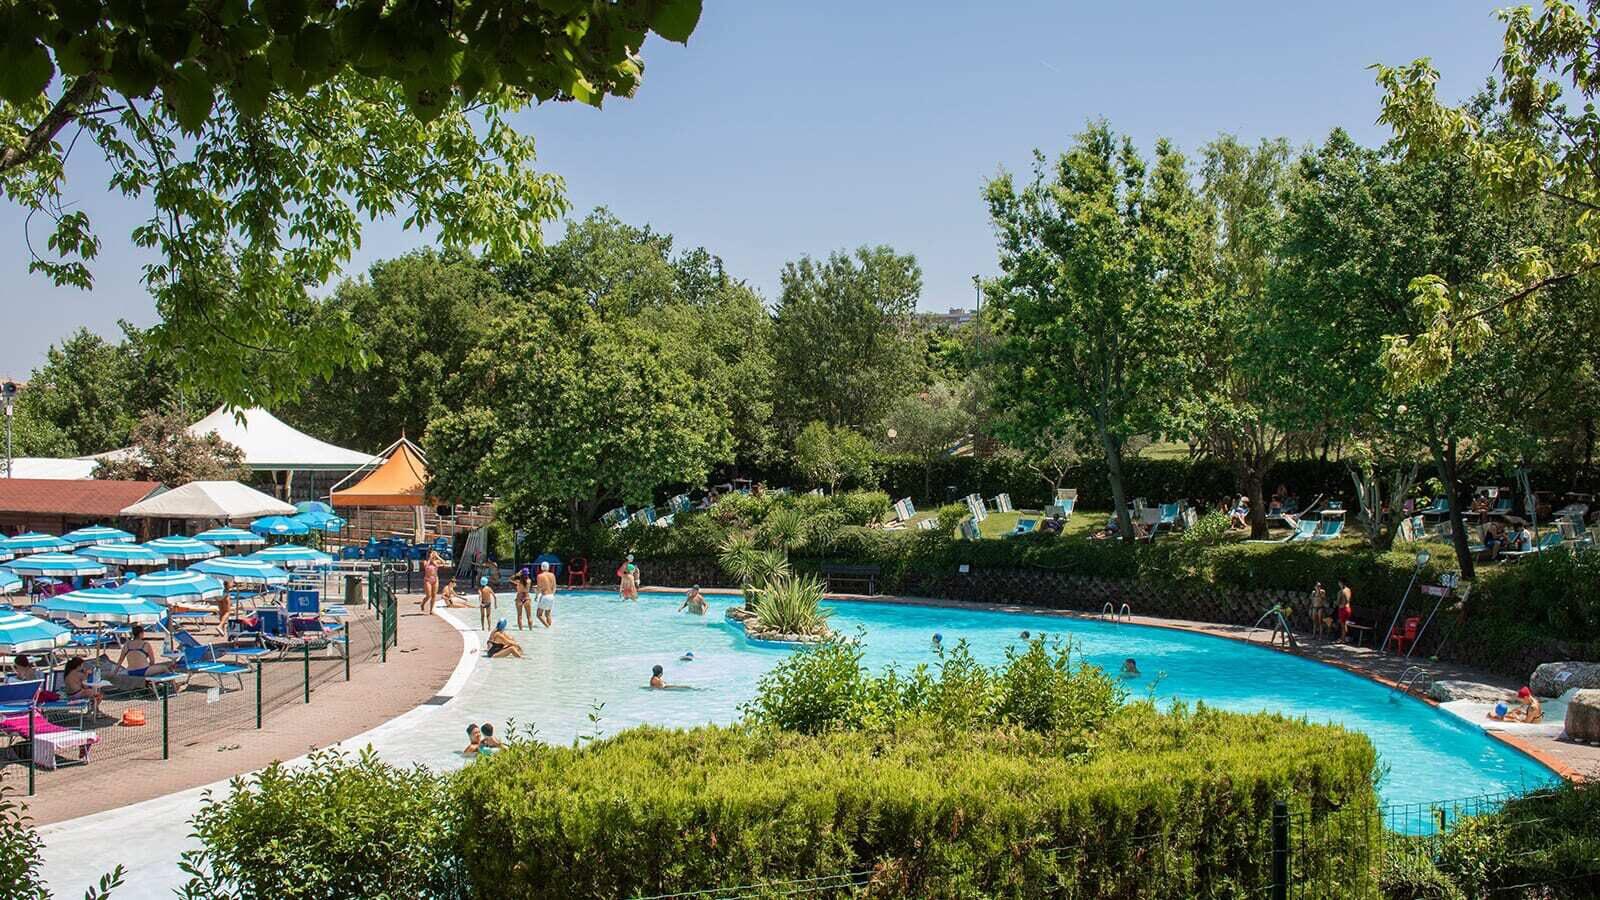 Camping - Centro Vacanze San Marino